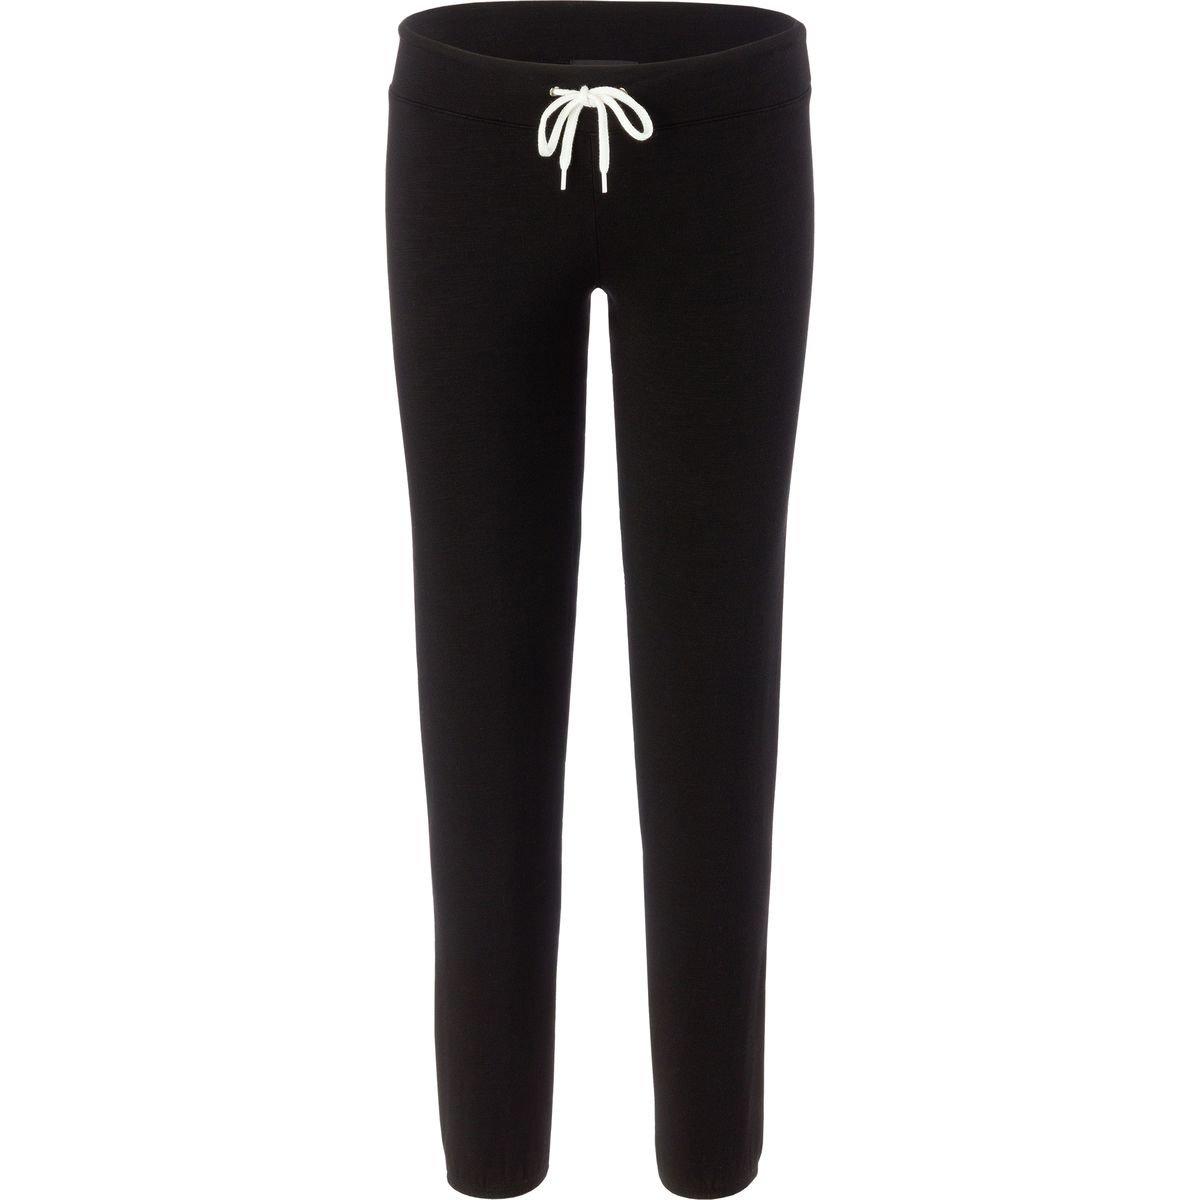 Monrow Women's Supersoft Sweats, Black, S